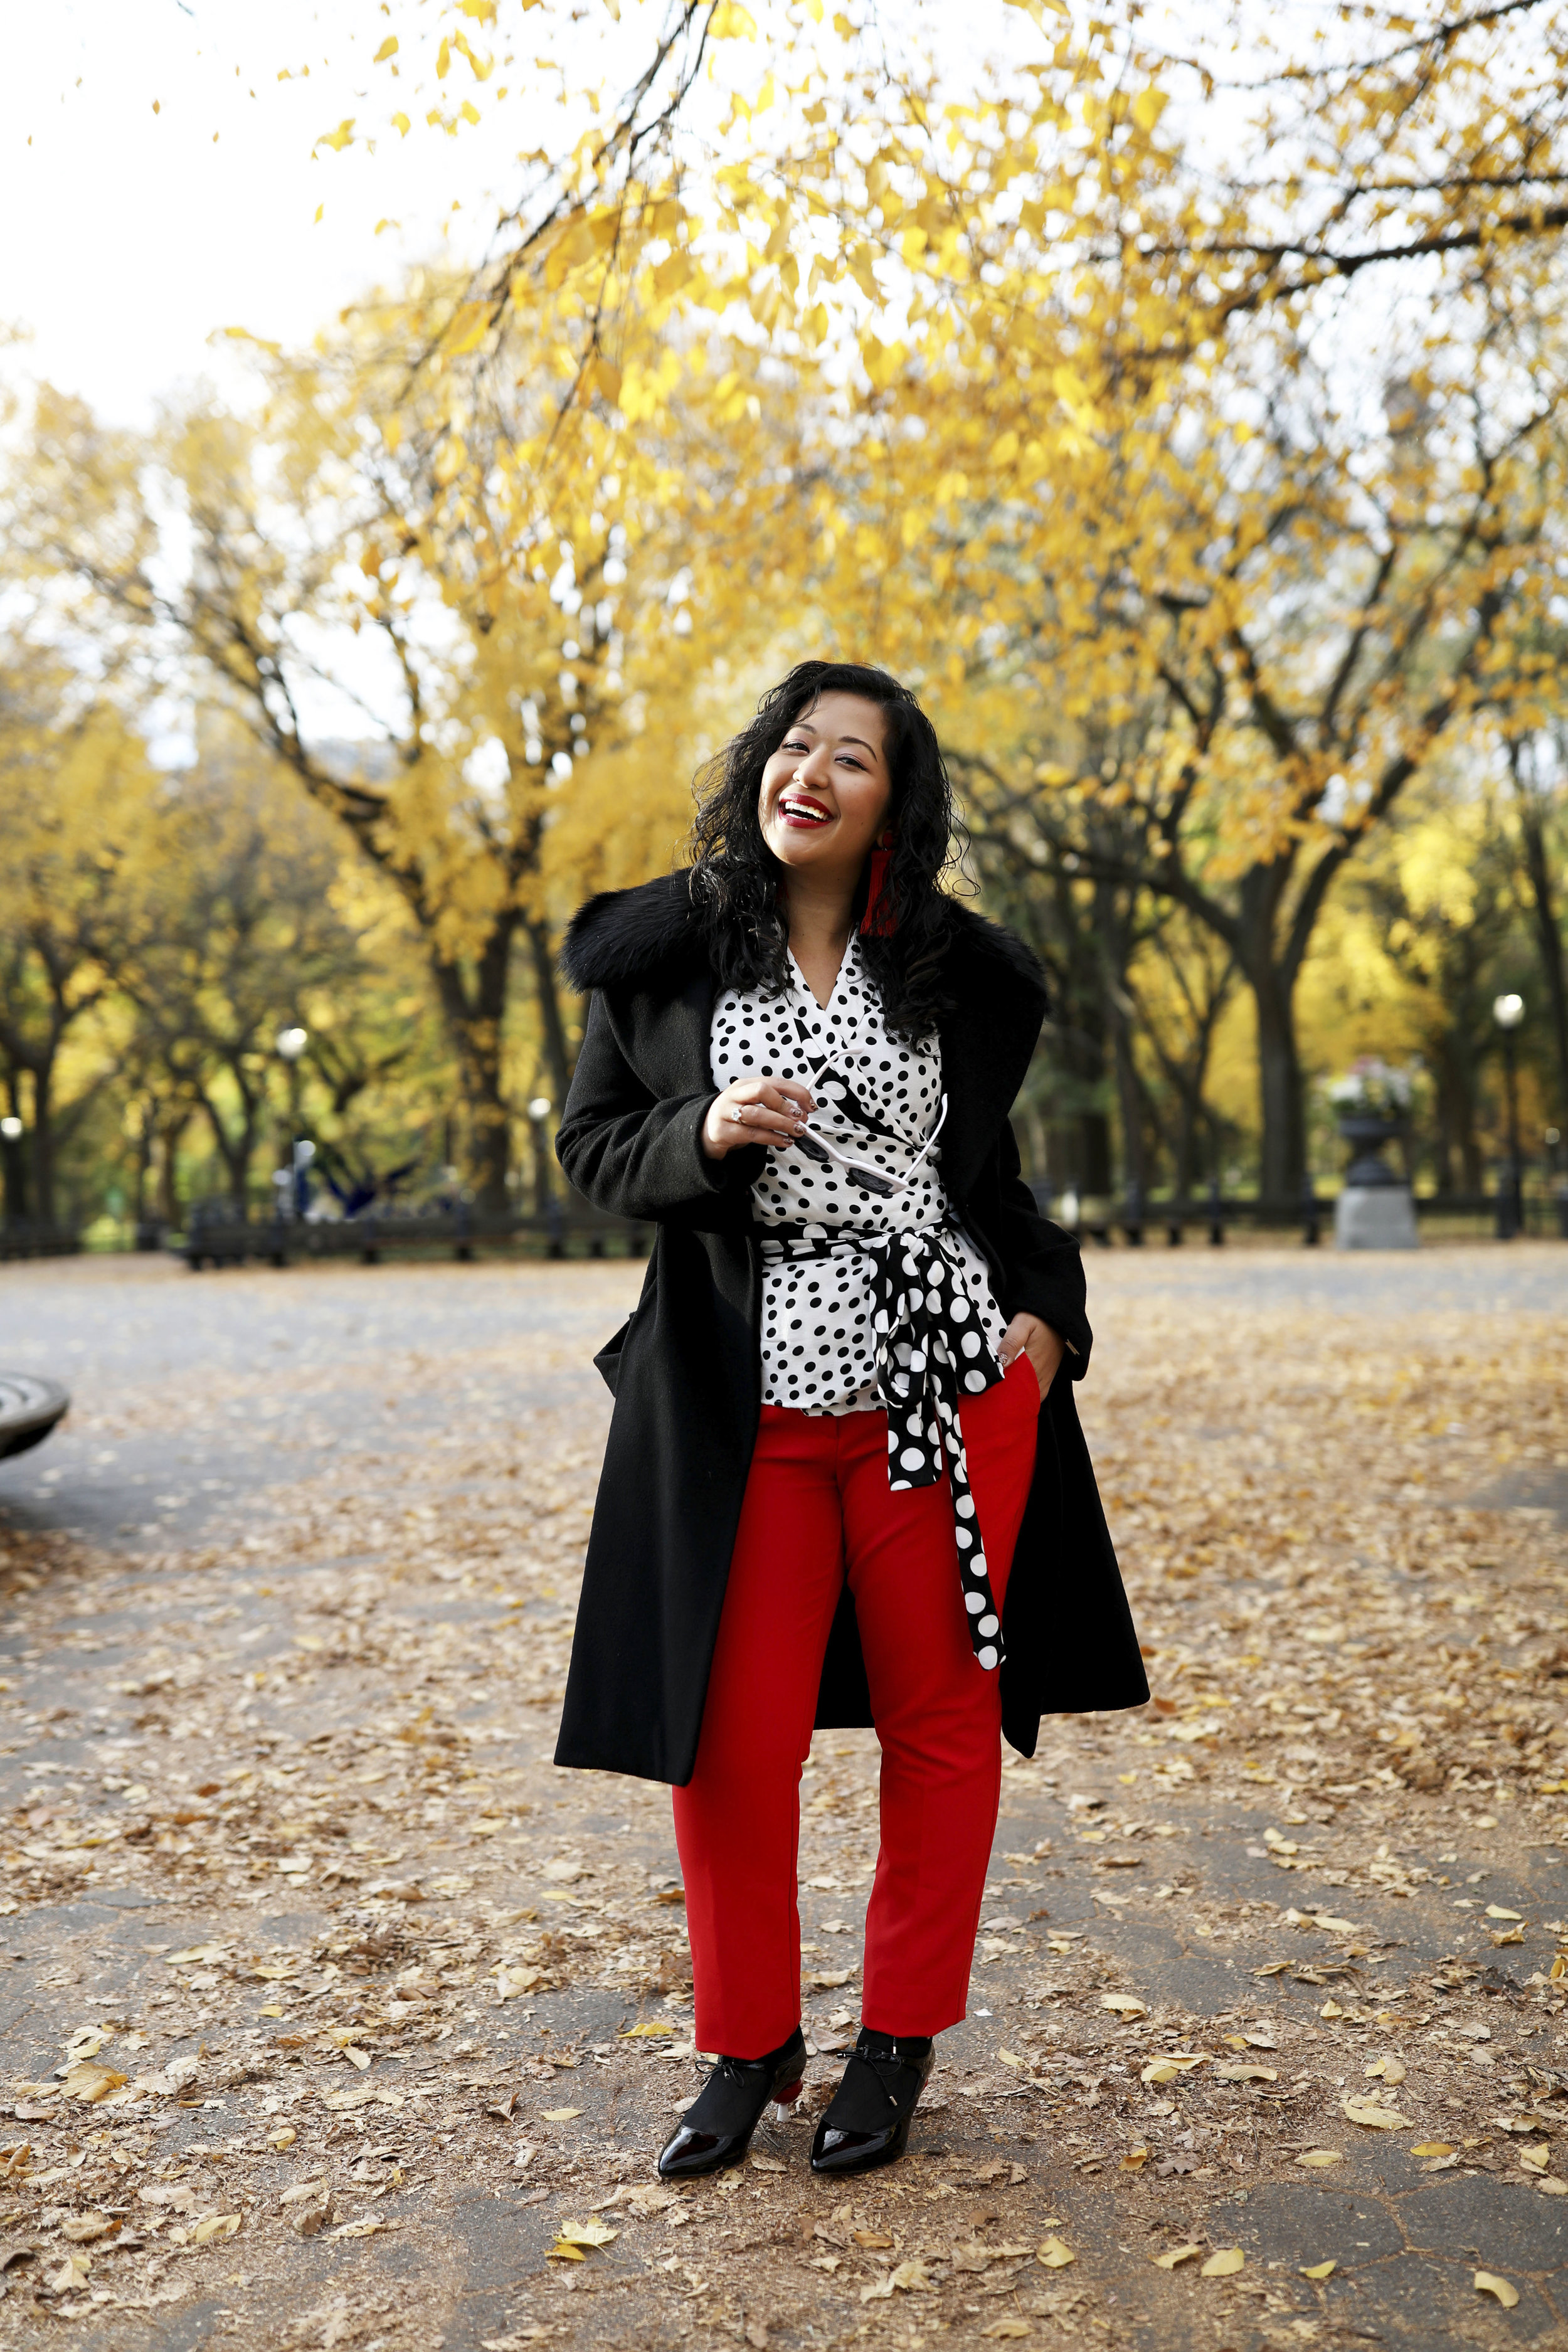 Krity S x Fall Work Outfit x Polka Dot9.jpg